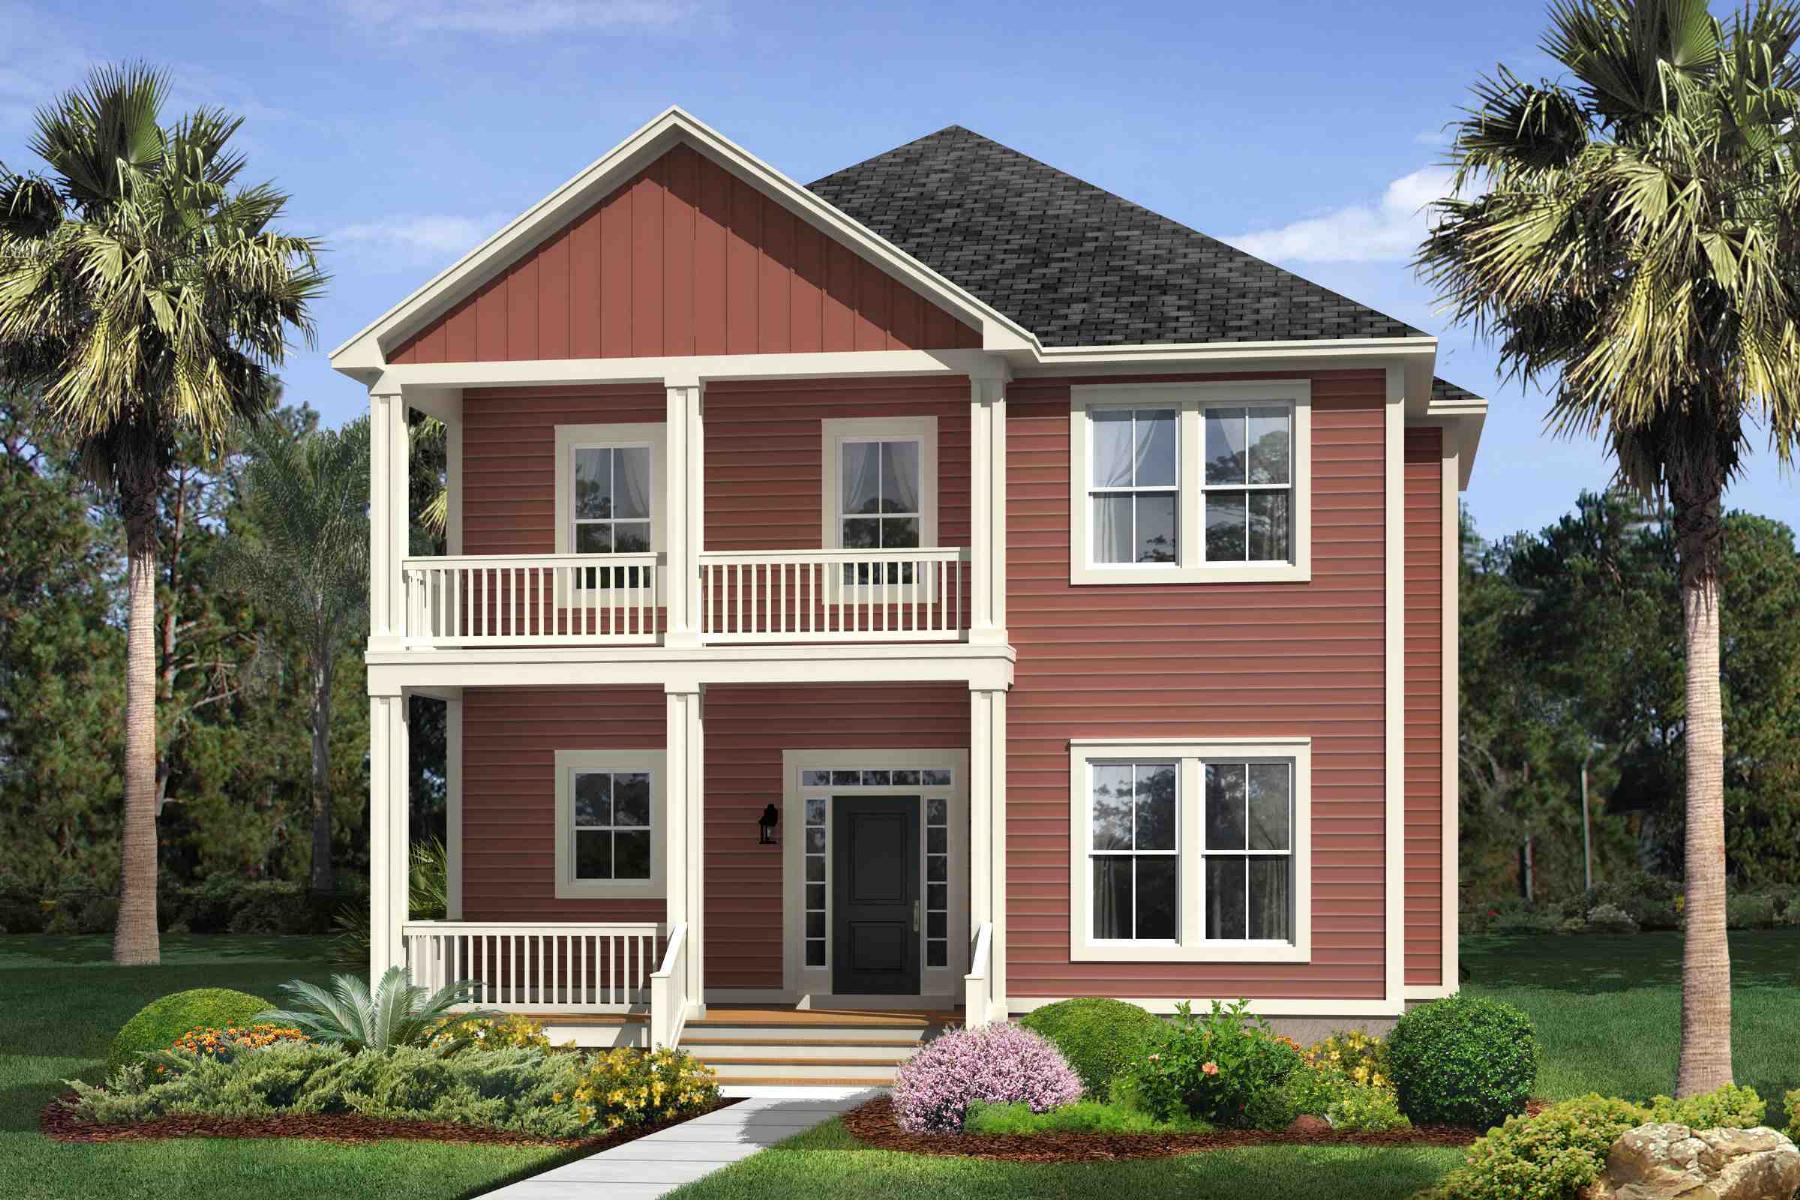 Ryland Homes Md Home Review Ryland Homes Md Home Review Ryland Homes Sc Home Review